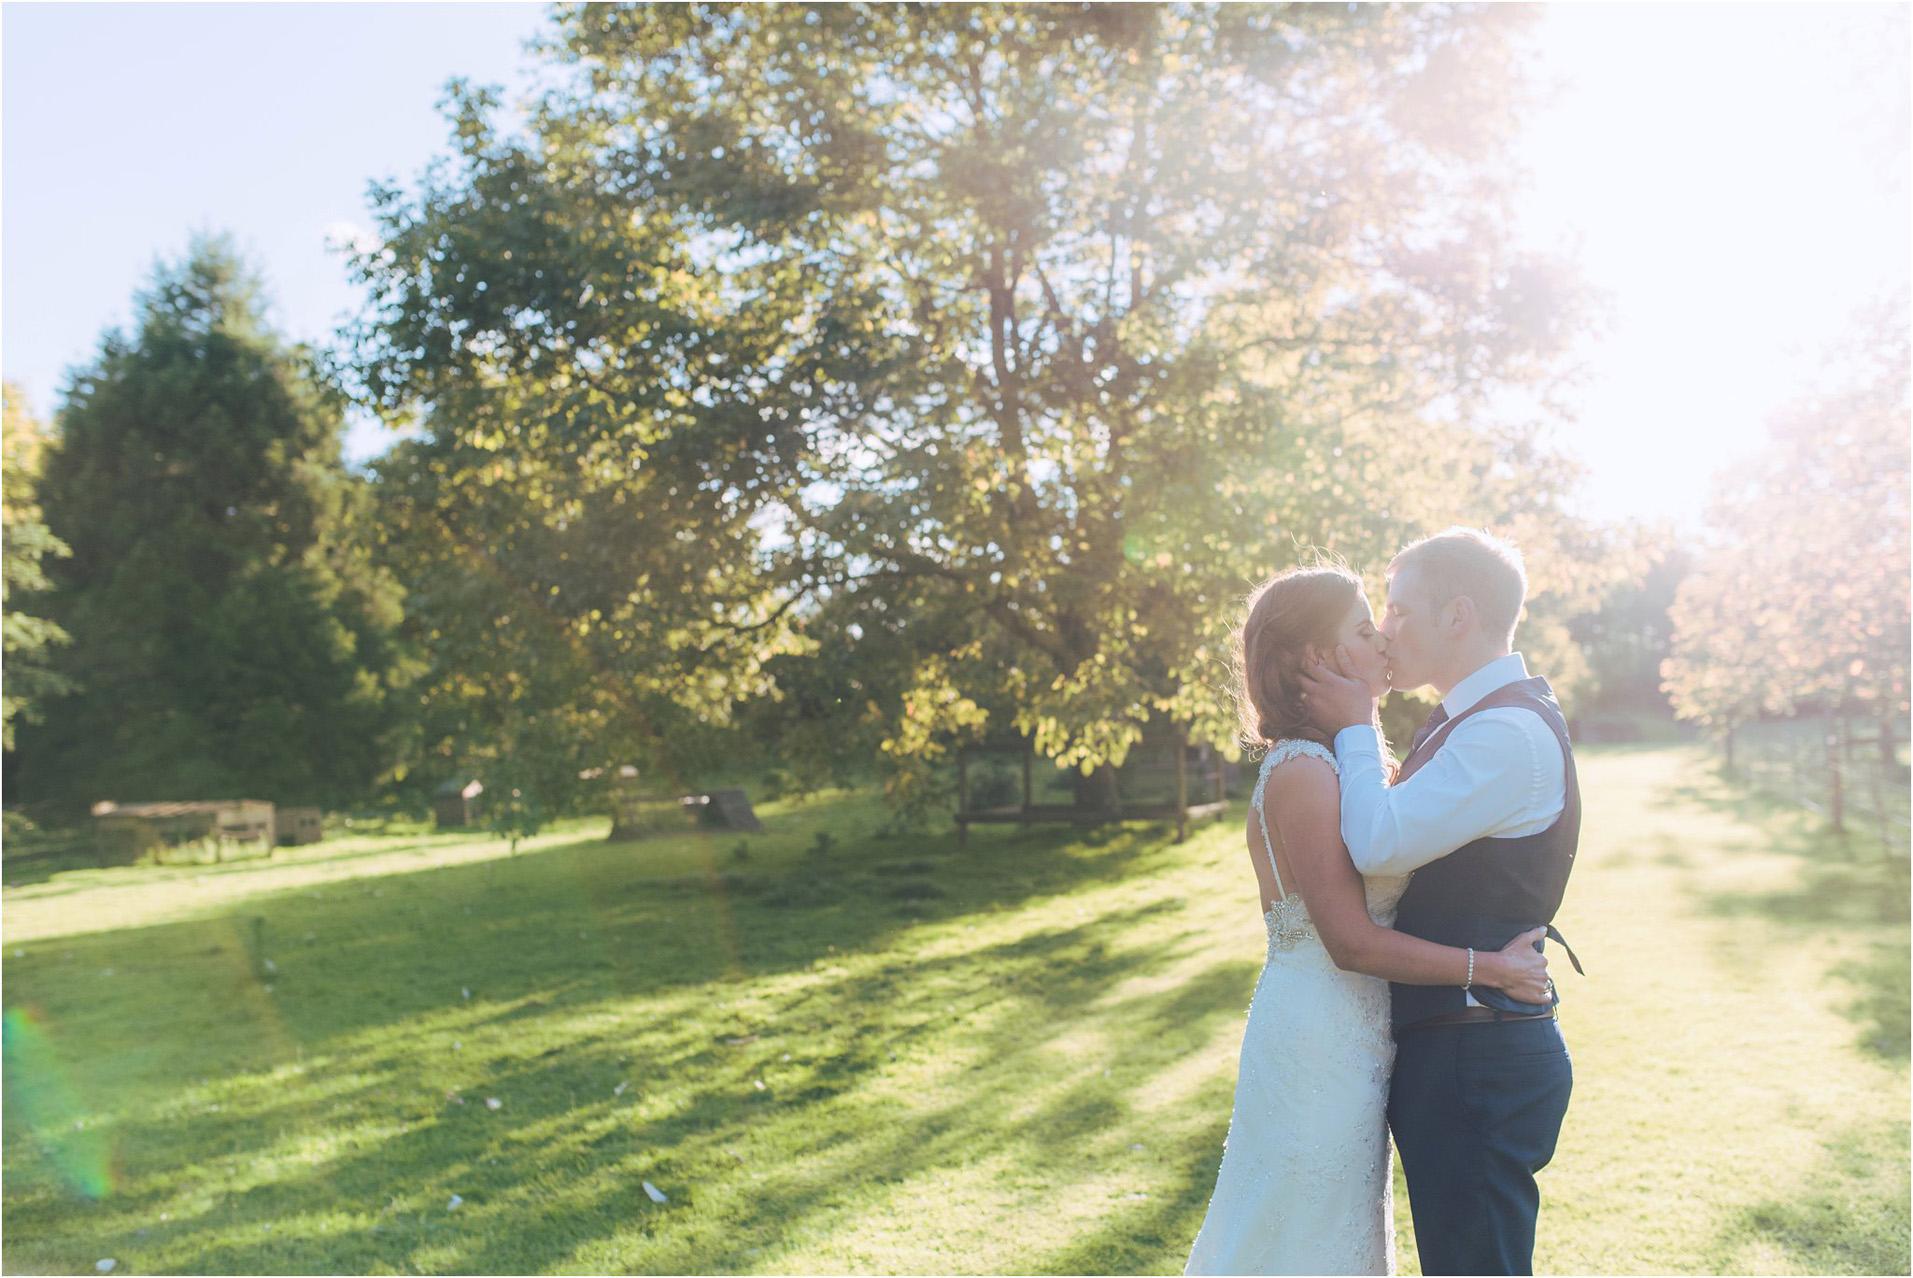 Simon biffen wedding photography 0133